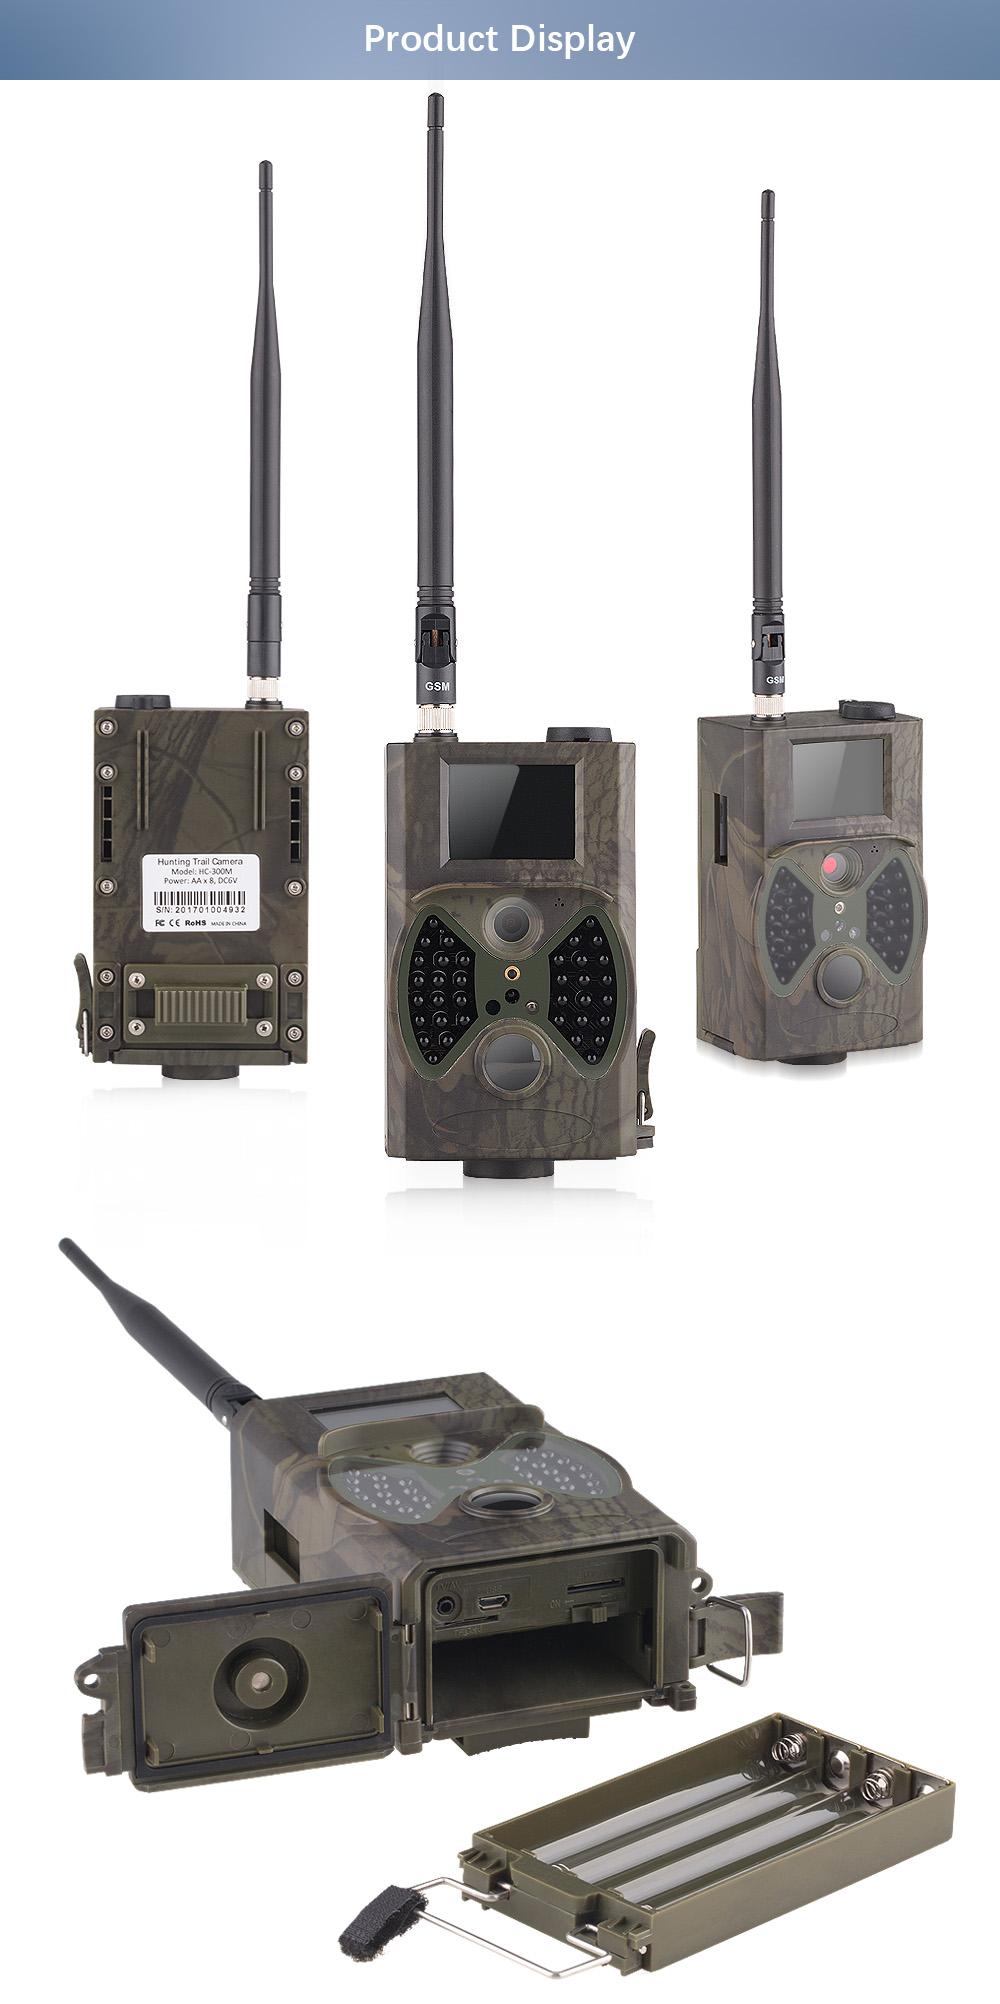 Wildlife Hunting trail camera HC 300M 2 TFT IR Hunting Camera LCD Screen wildlife detector Night vision wild camera (9)